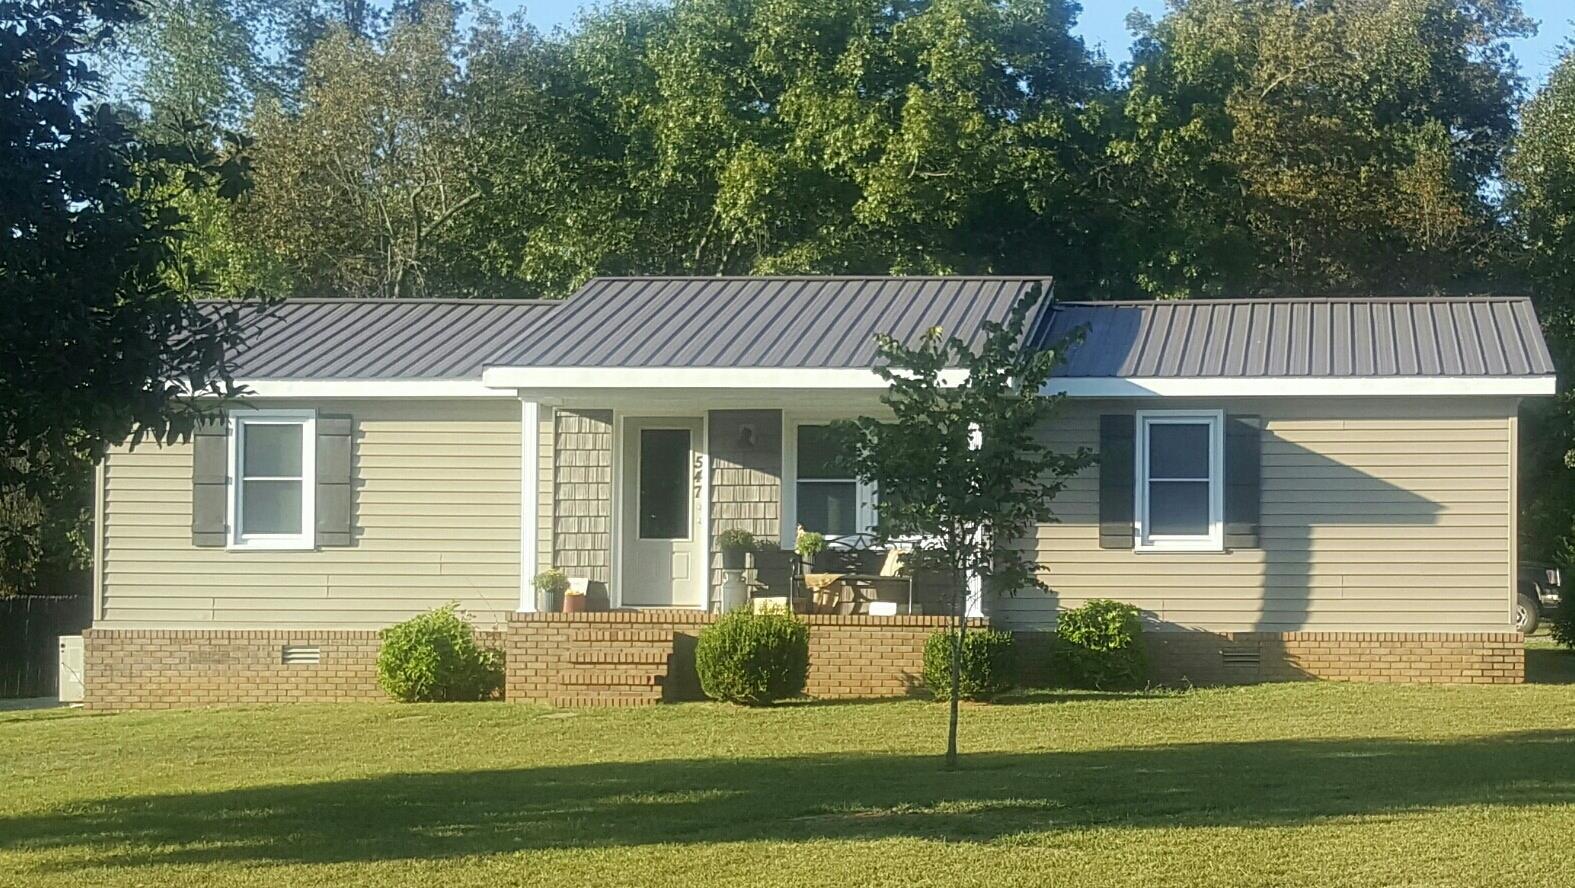 547 Hidden Valley Cir, Mc Minnville, TN 37110